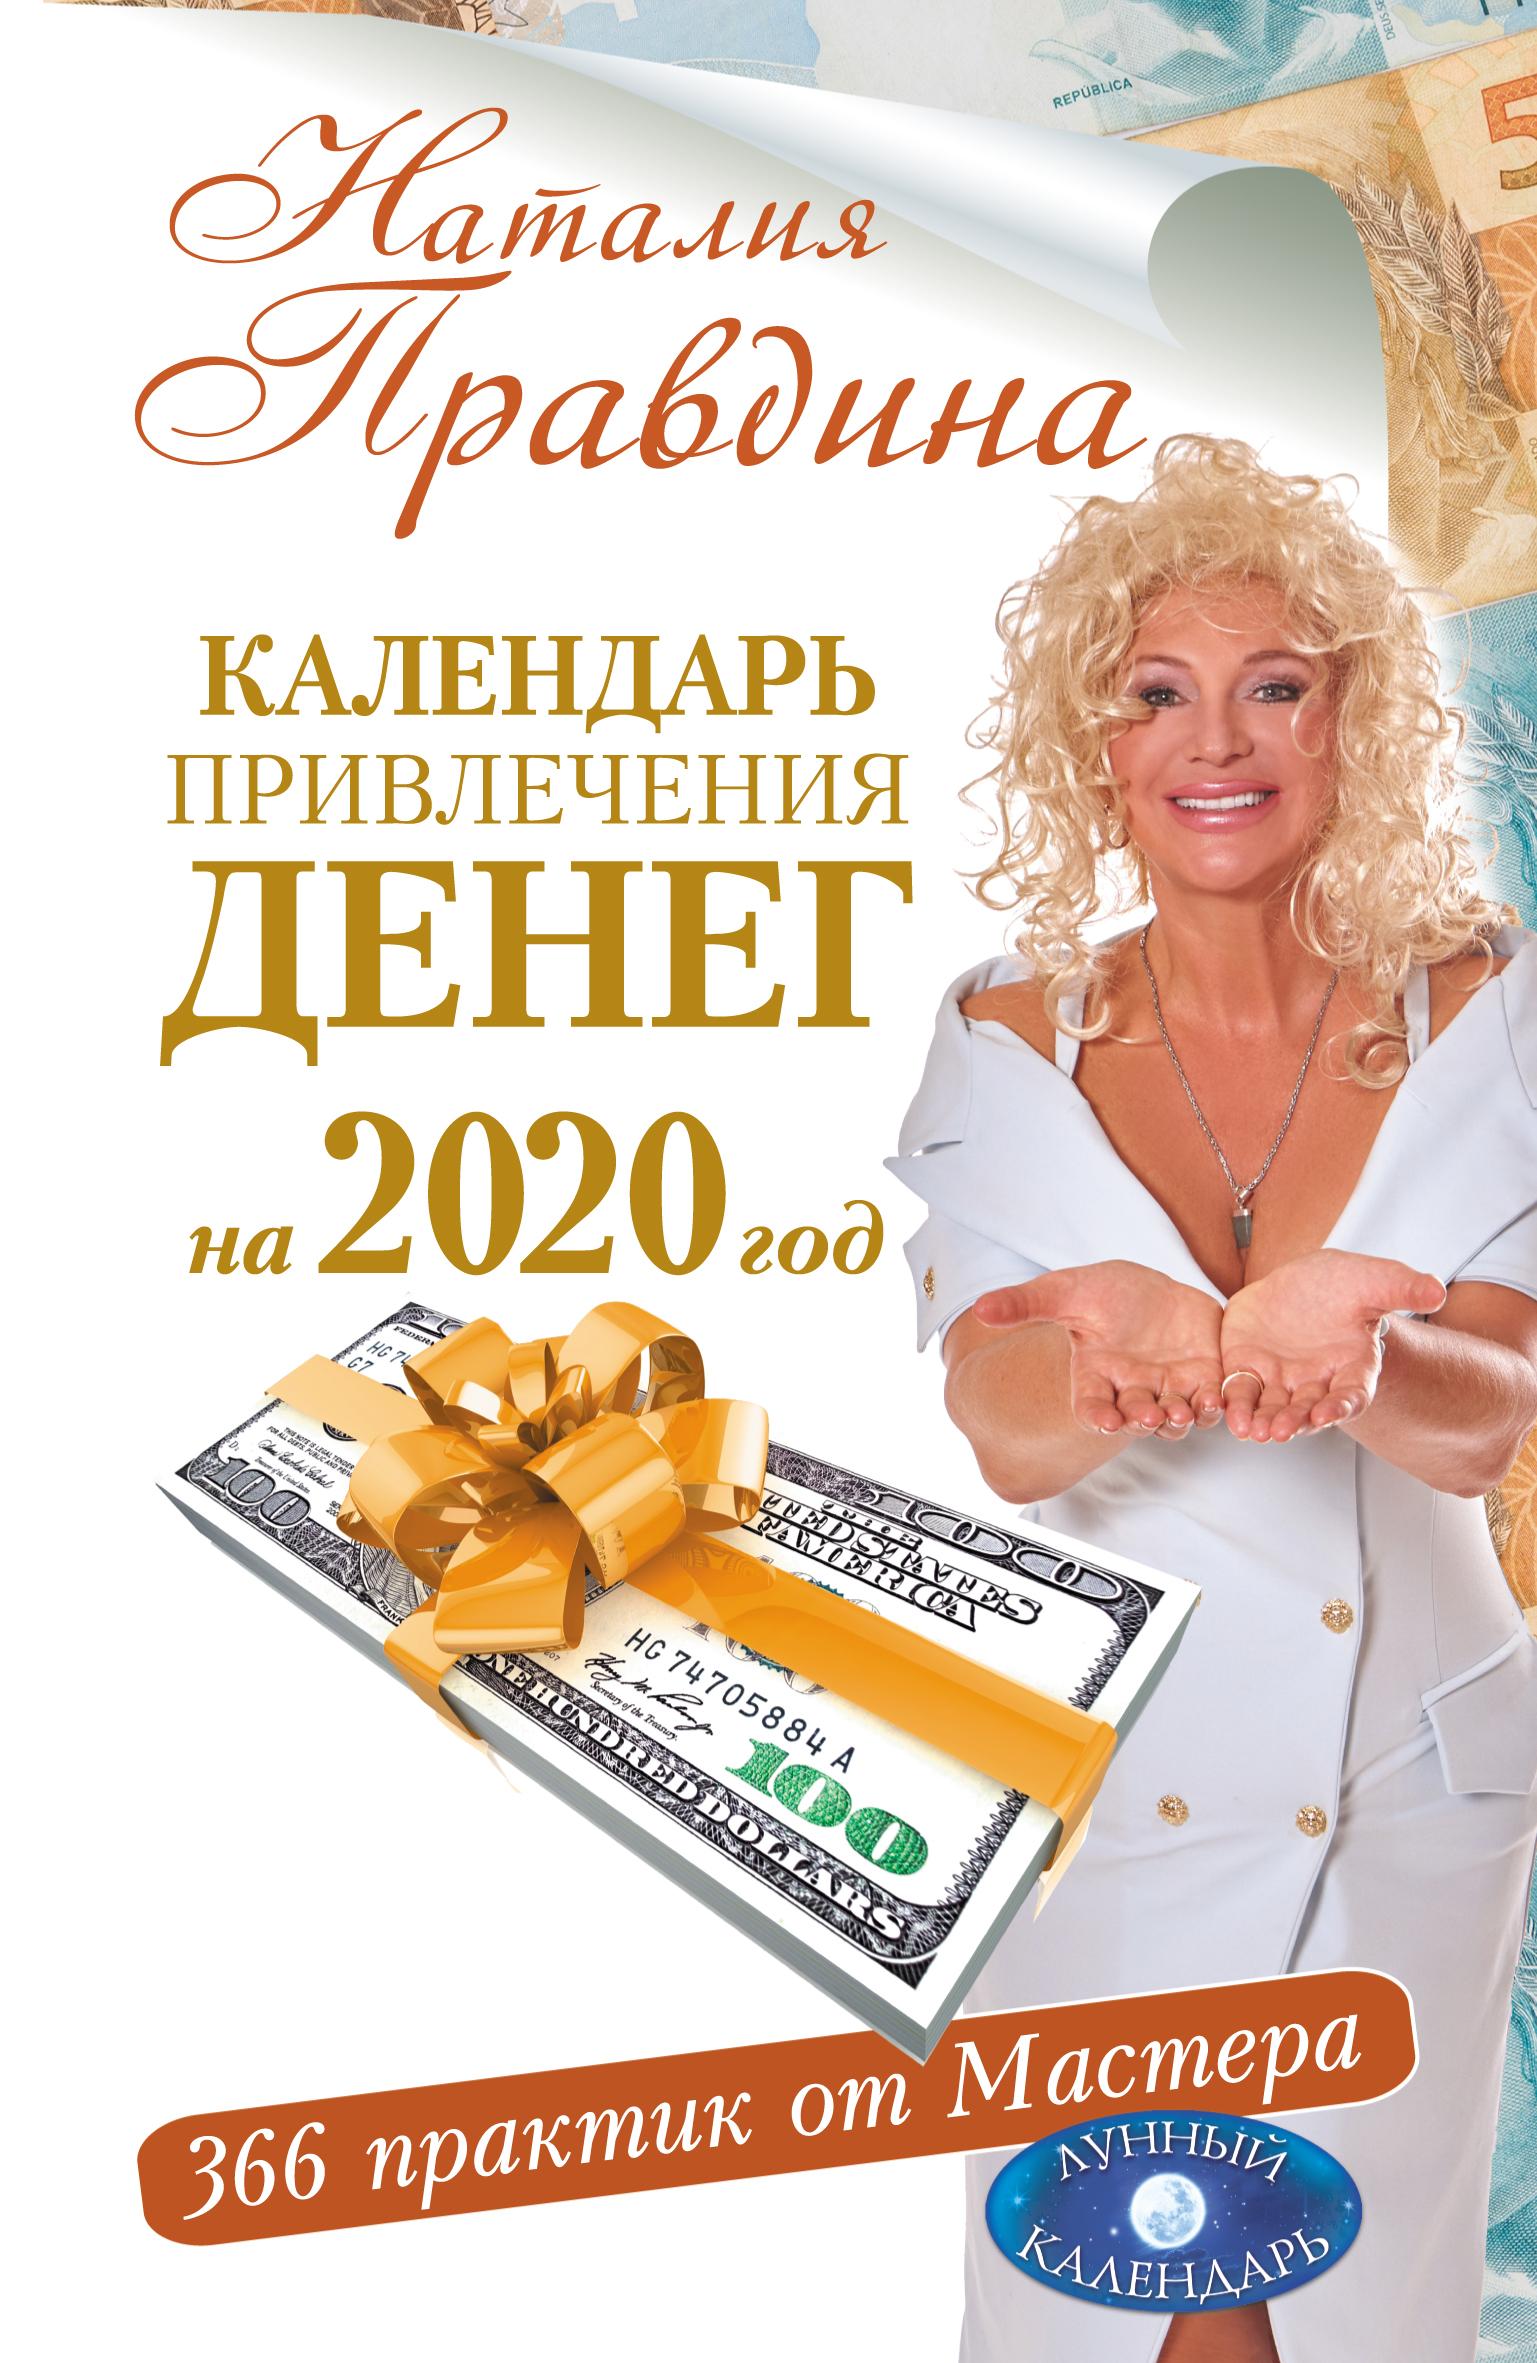 Календарь привлечения денег на 2020 год. 366 практик от Мастера. Лунный календарь